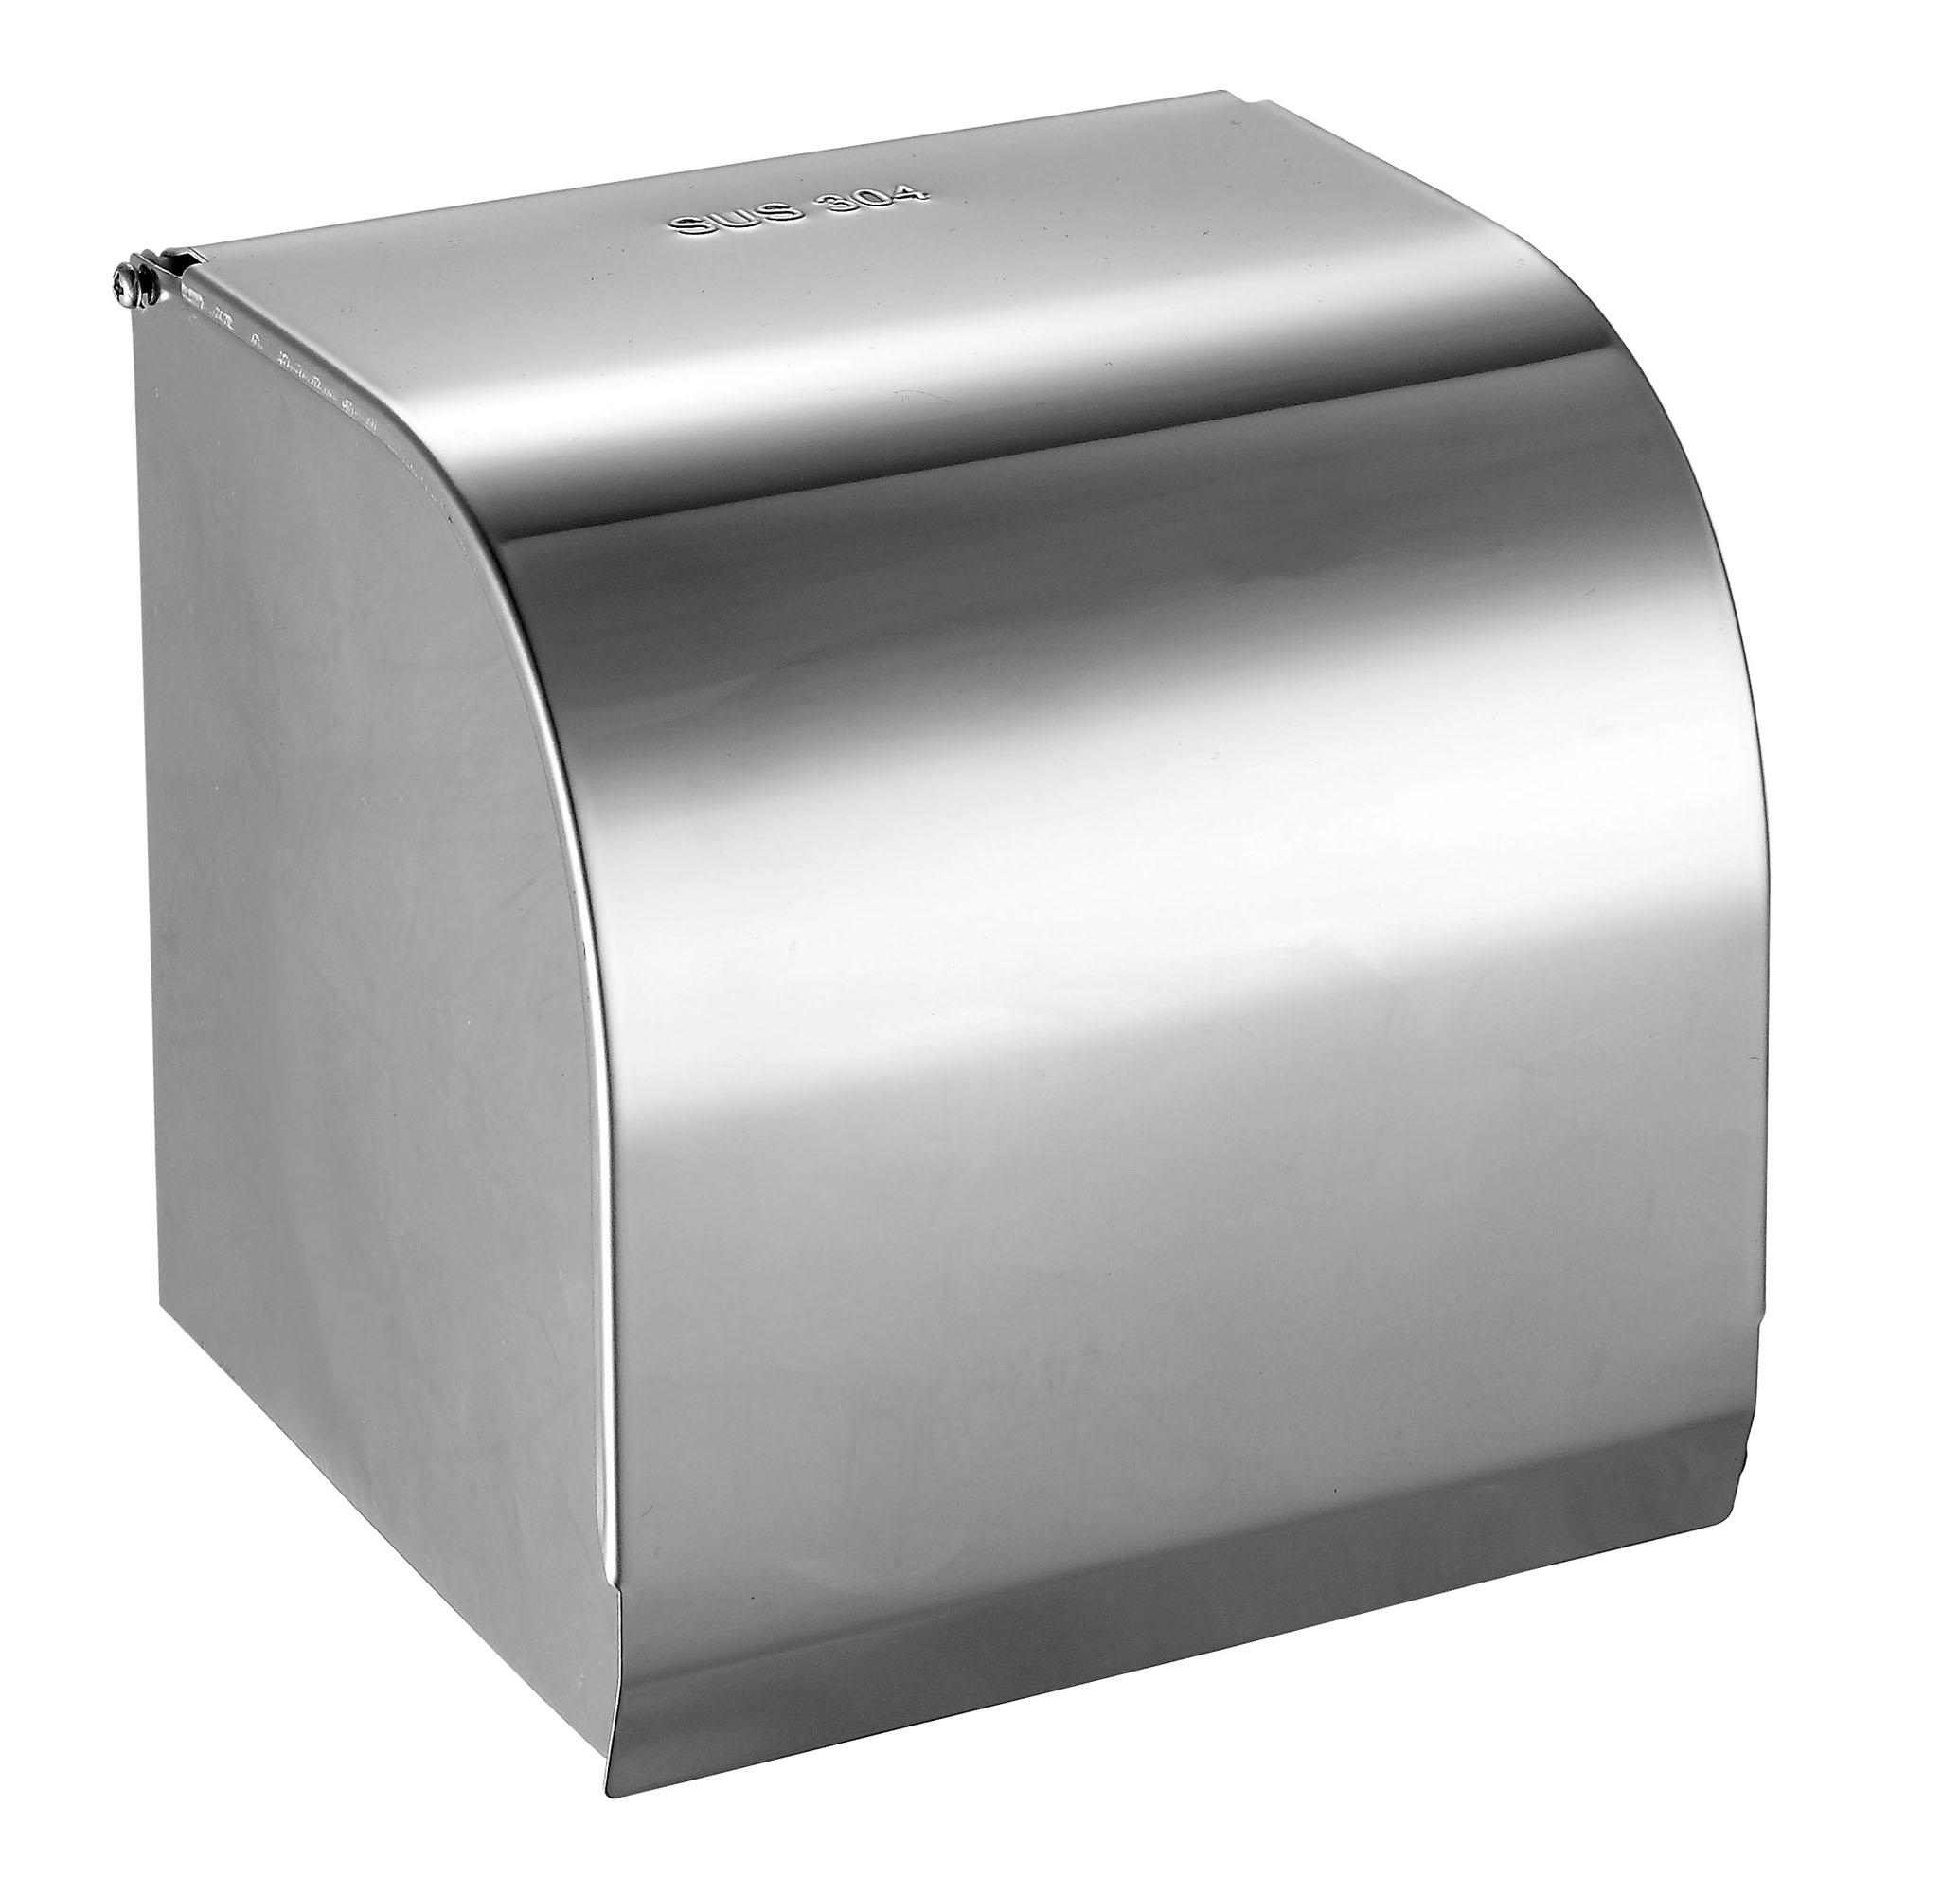 Stainless steel toilet paper holder,Bathroom Accessories tissue holder